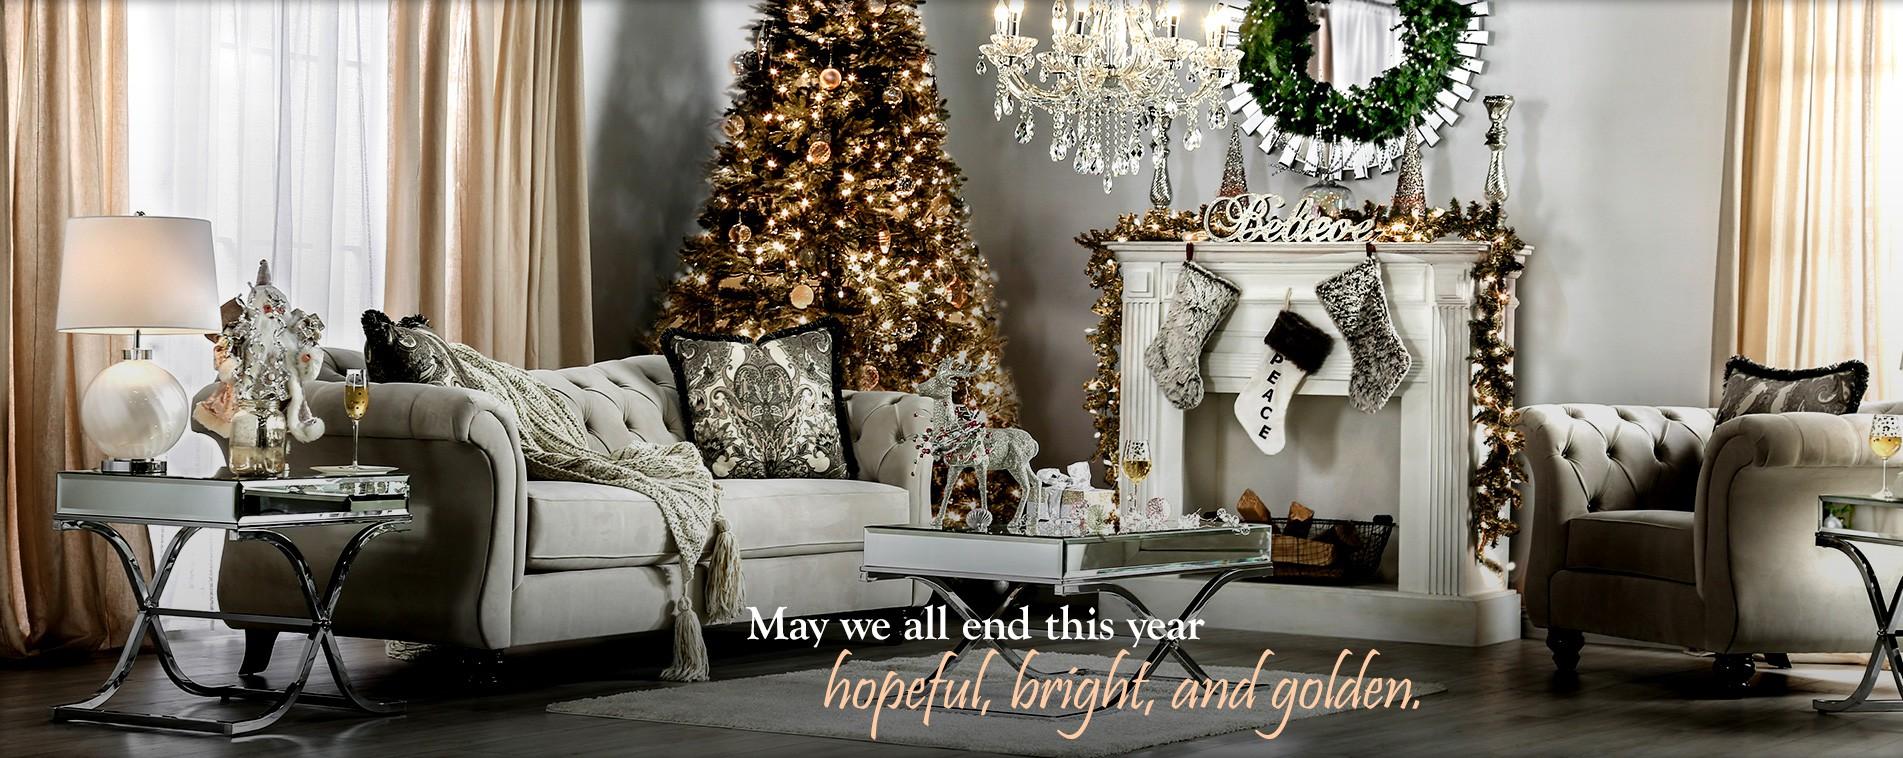 New Year Hope